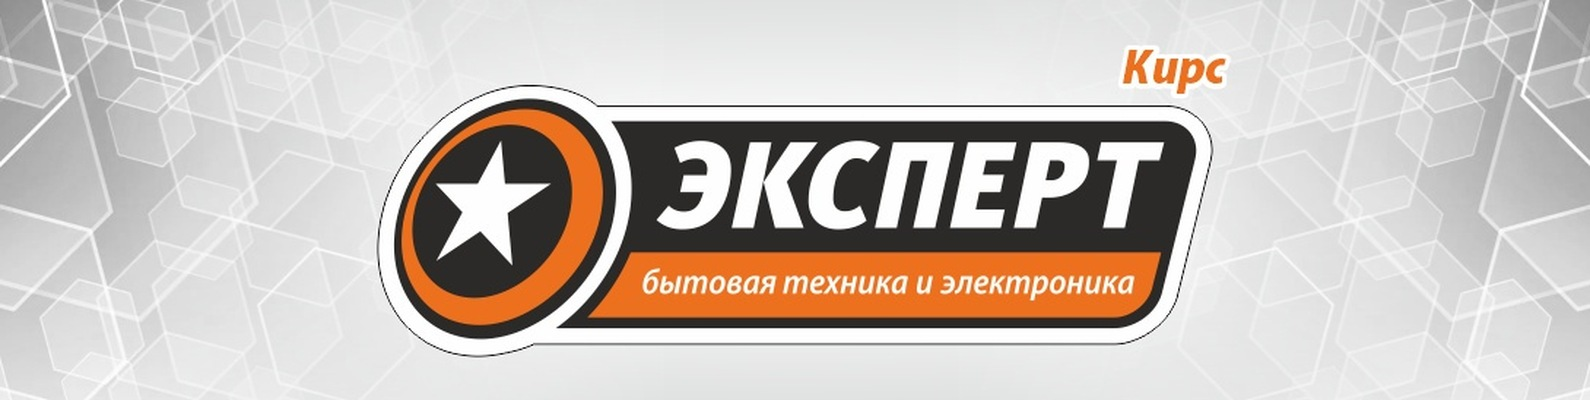 Креативная реклама интернет магазина